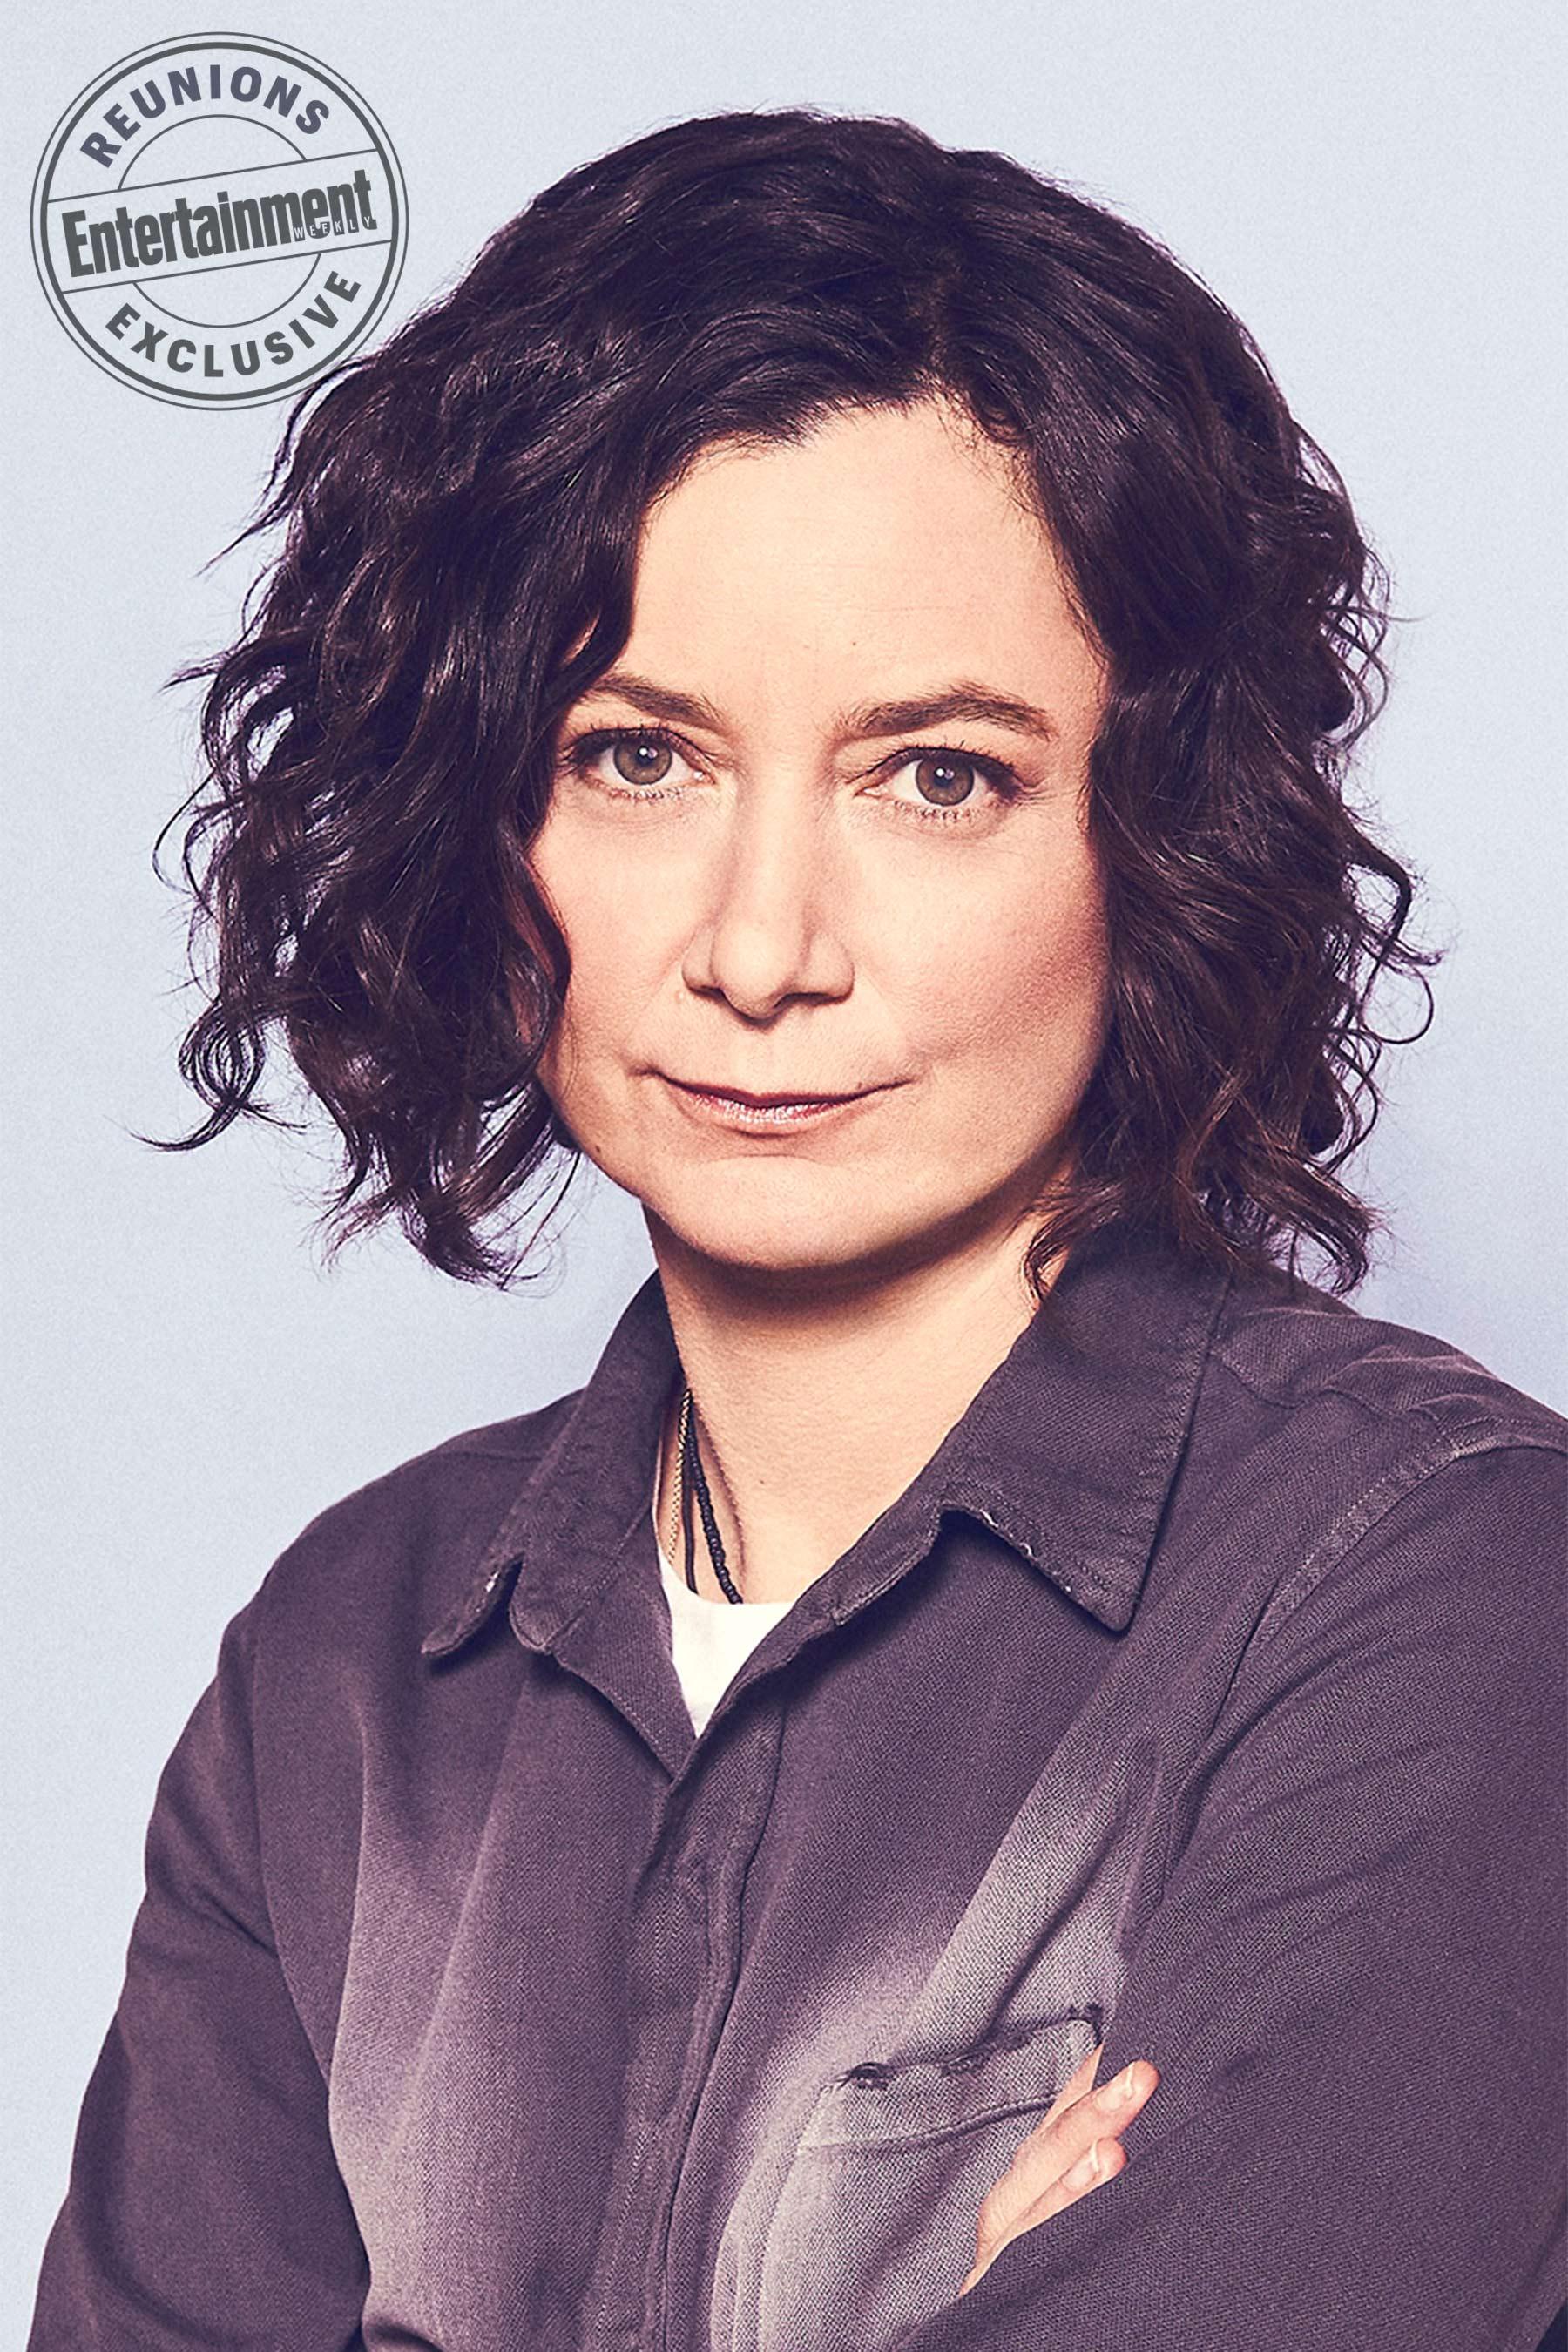 Roseanne Cast's Entertainment Weekly Portraits - Sara Gilbert as Darlene Conner